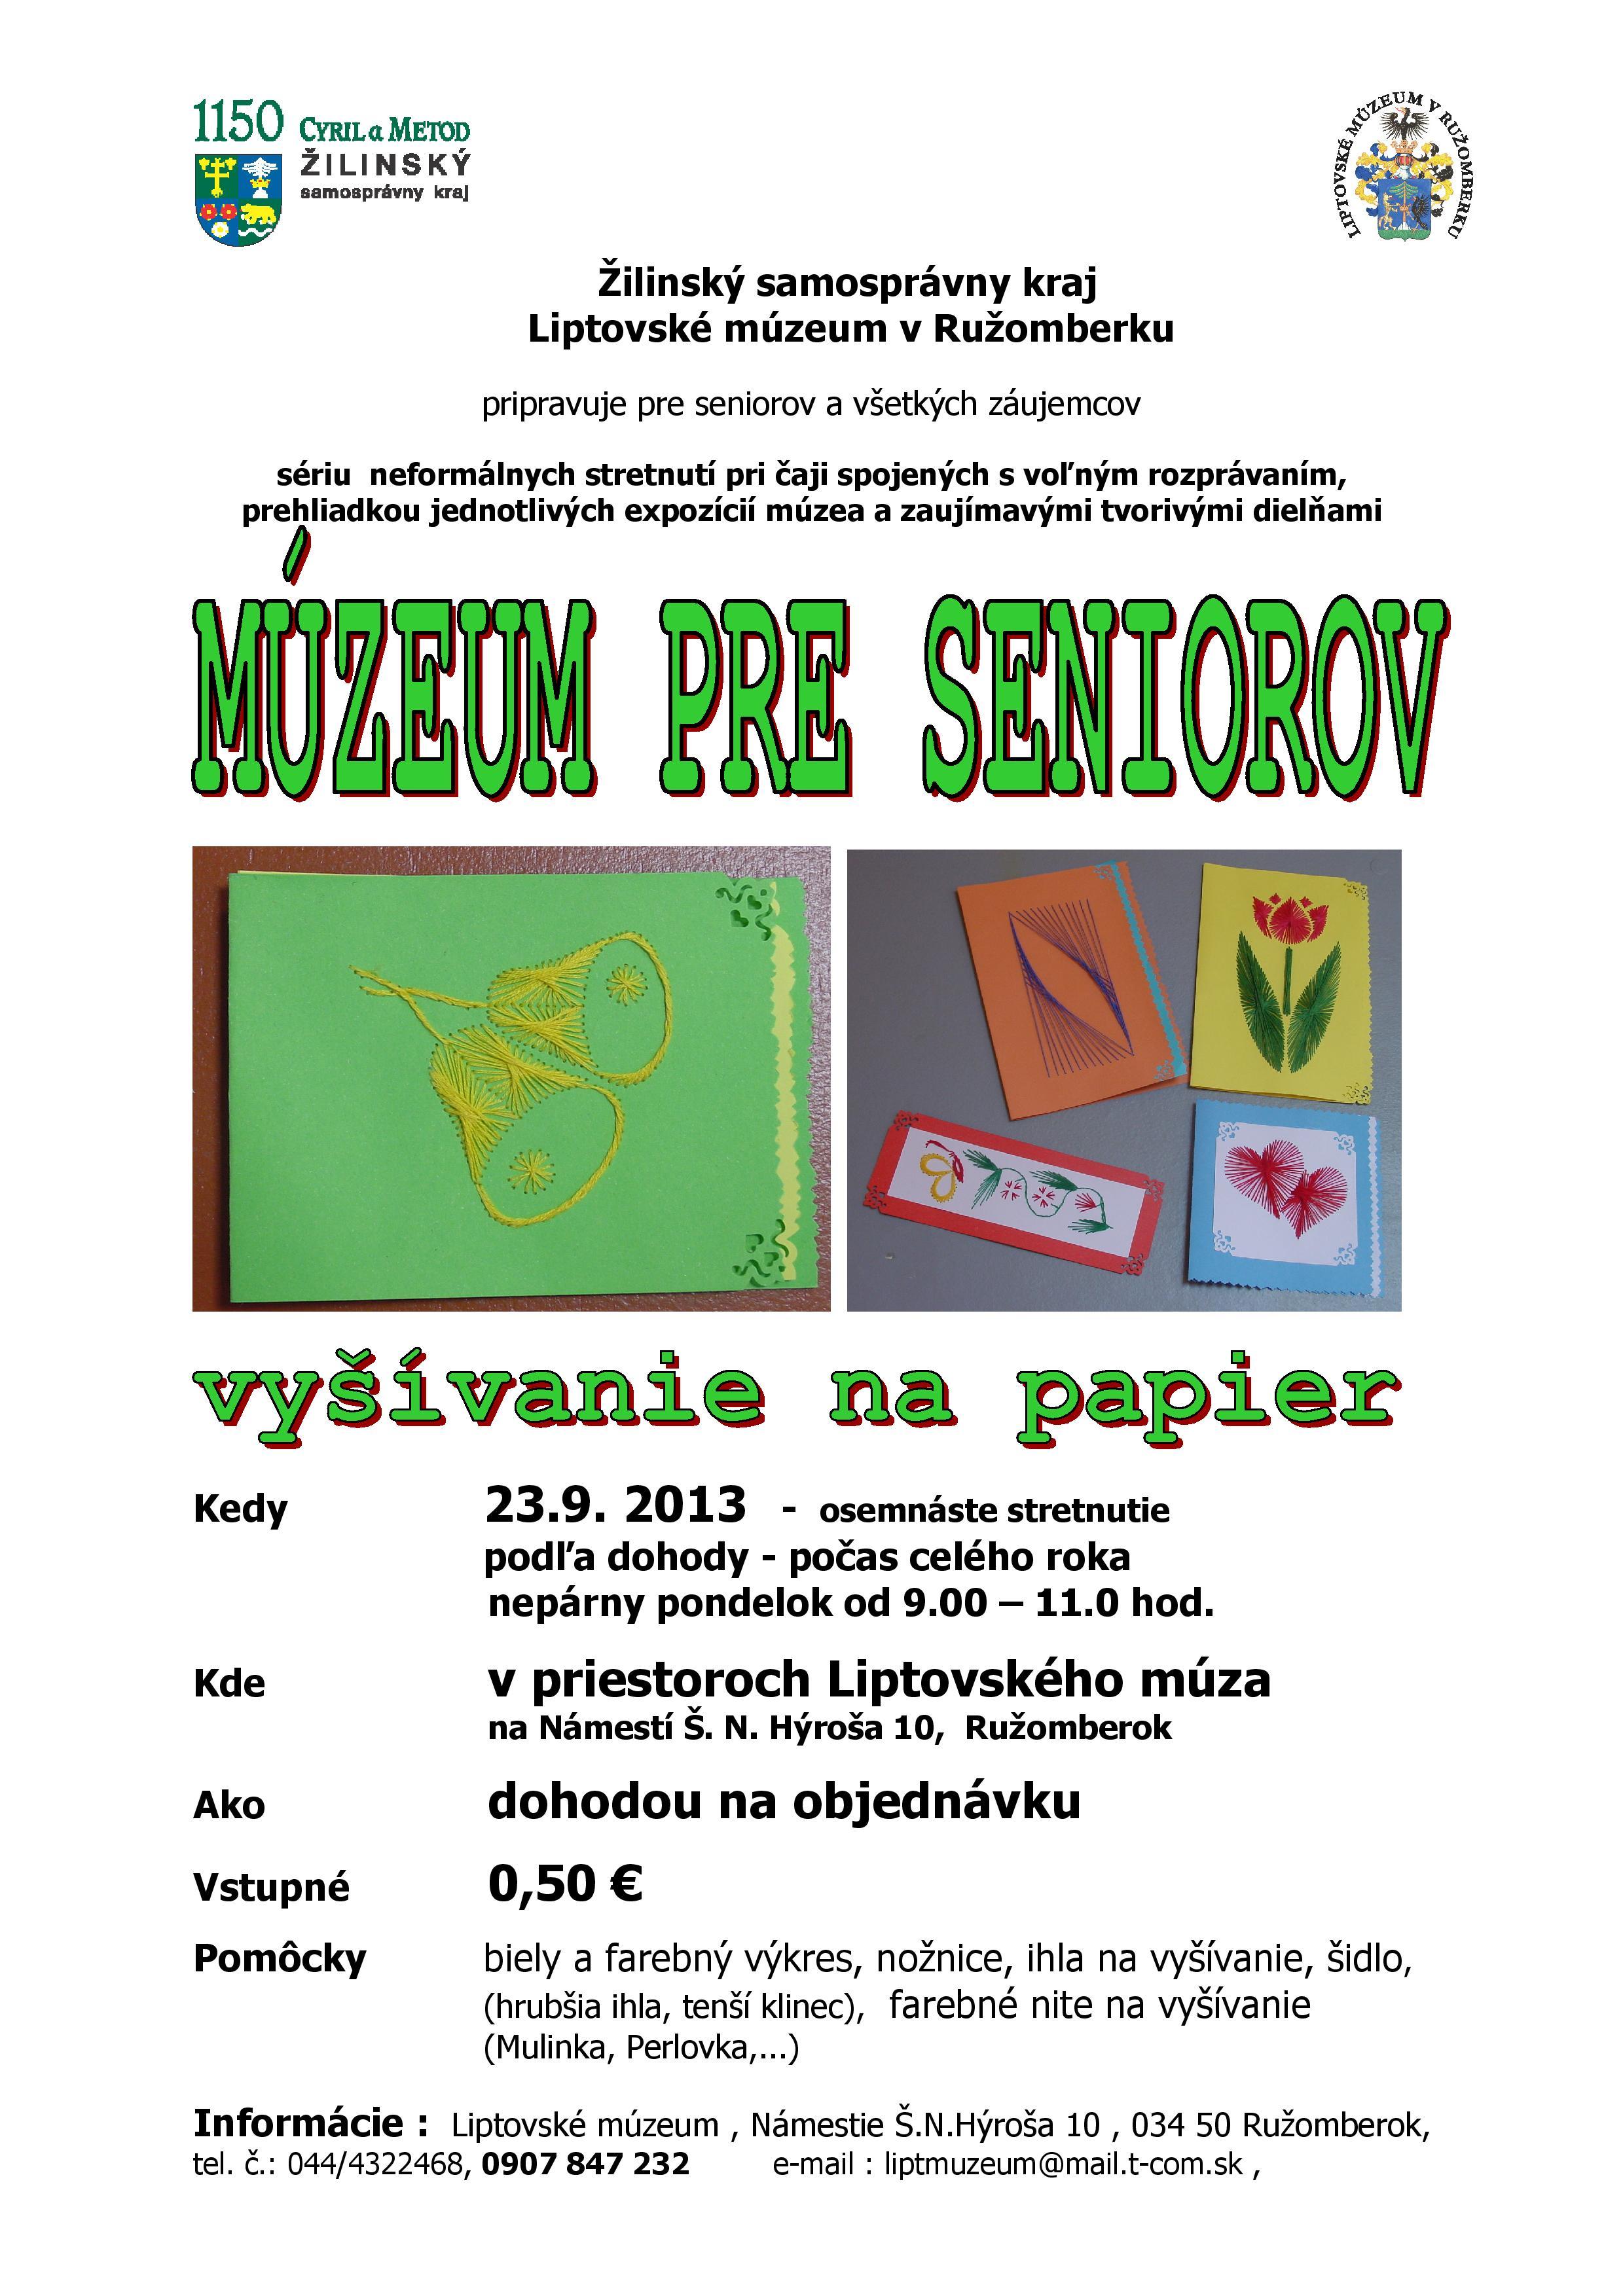 mps-vysivanie-na-papier-23-september-2013-plagat